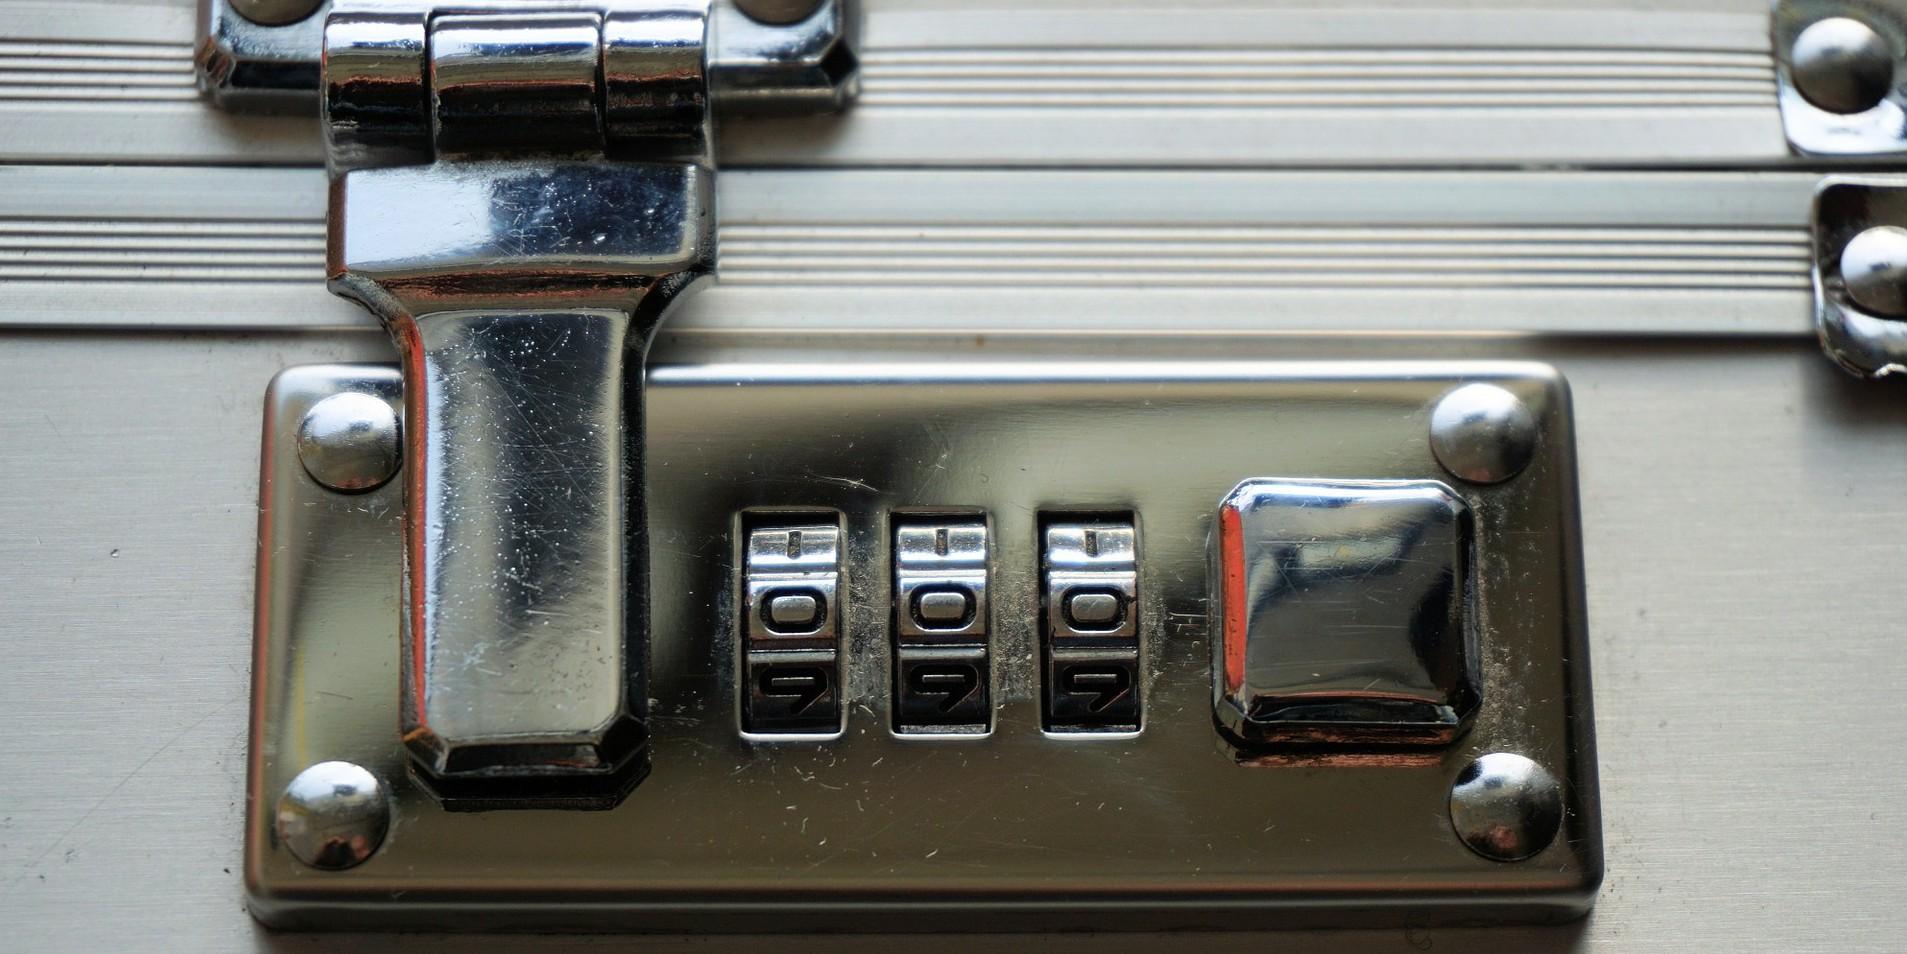 Combination lock image by webandi cc0 public domain via pixabay